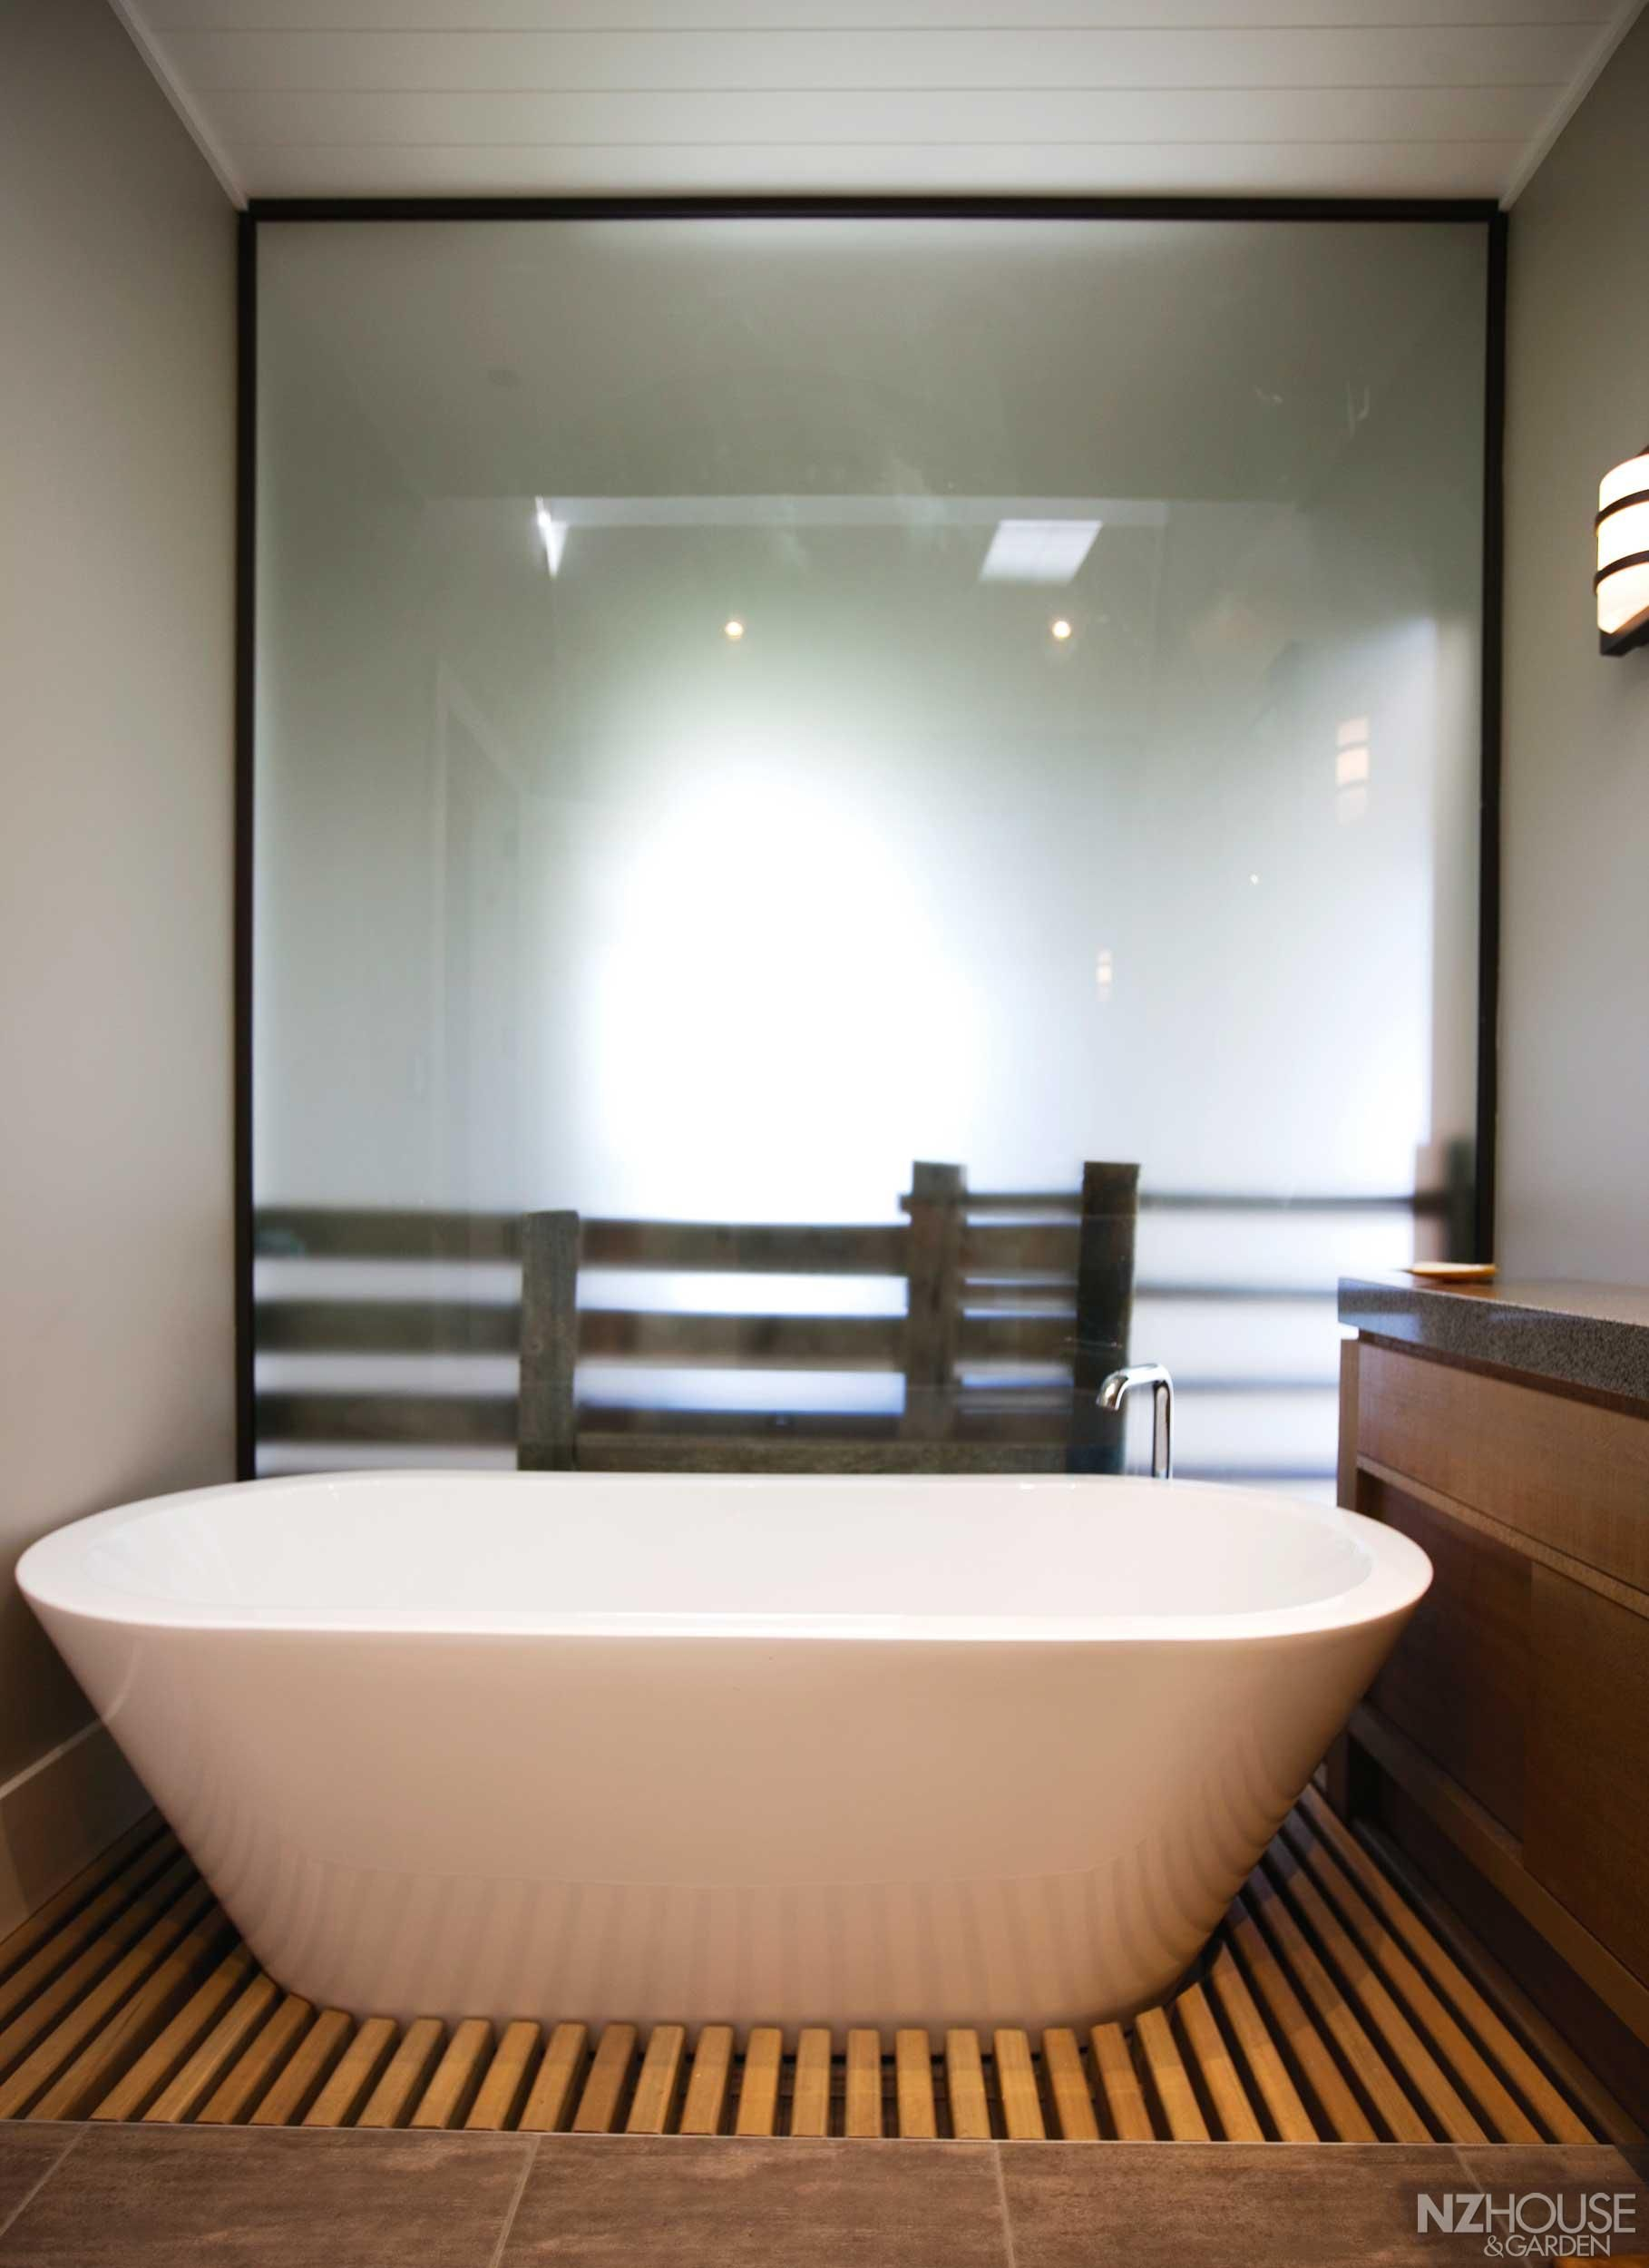 Kauri duckboarding around a freestanding bath in the main bathroom